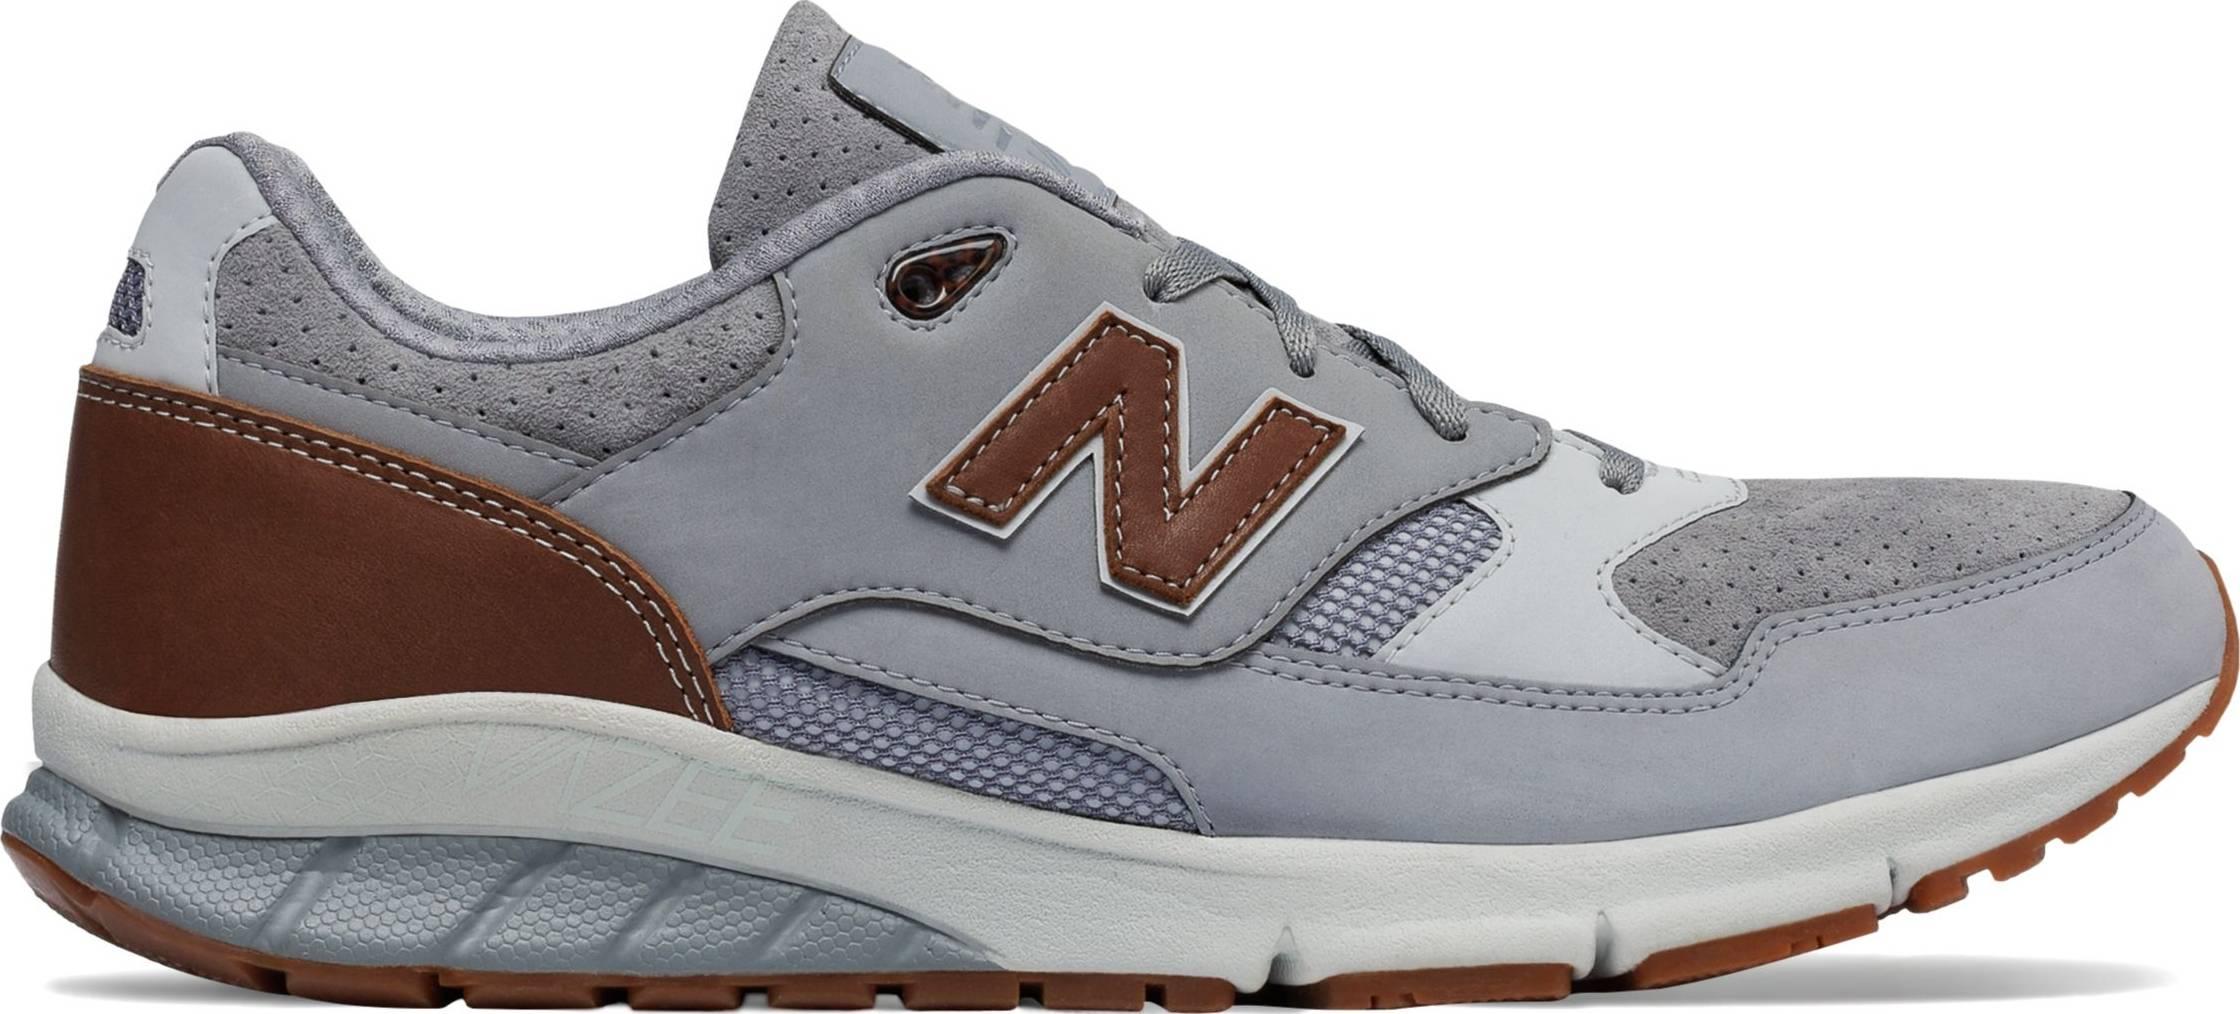 New Balance 530 Vazee